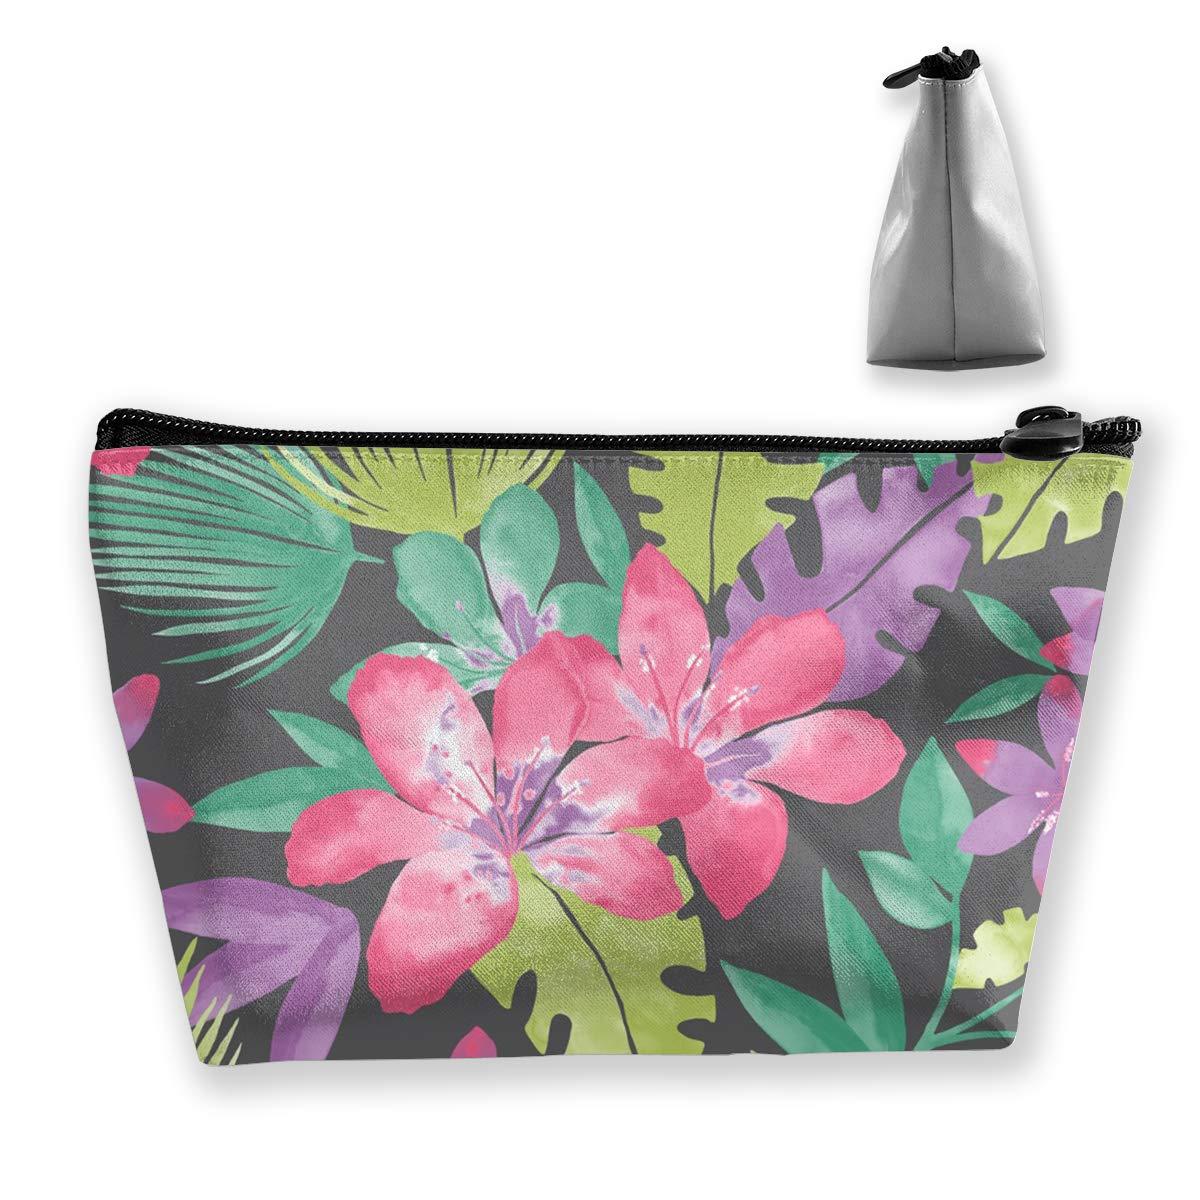 Trapezoid Toiletry Pouch Portable Travel Bag Leaf Tropical Floras Zipper Wallet